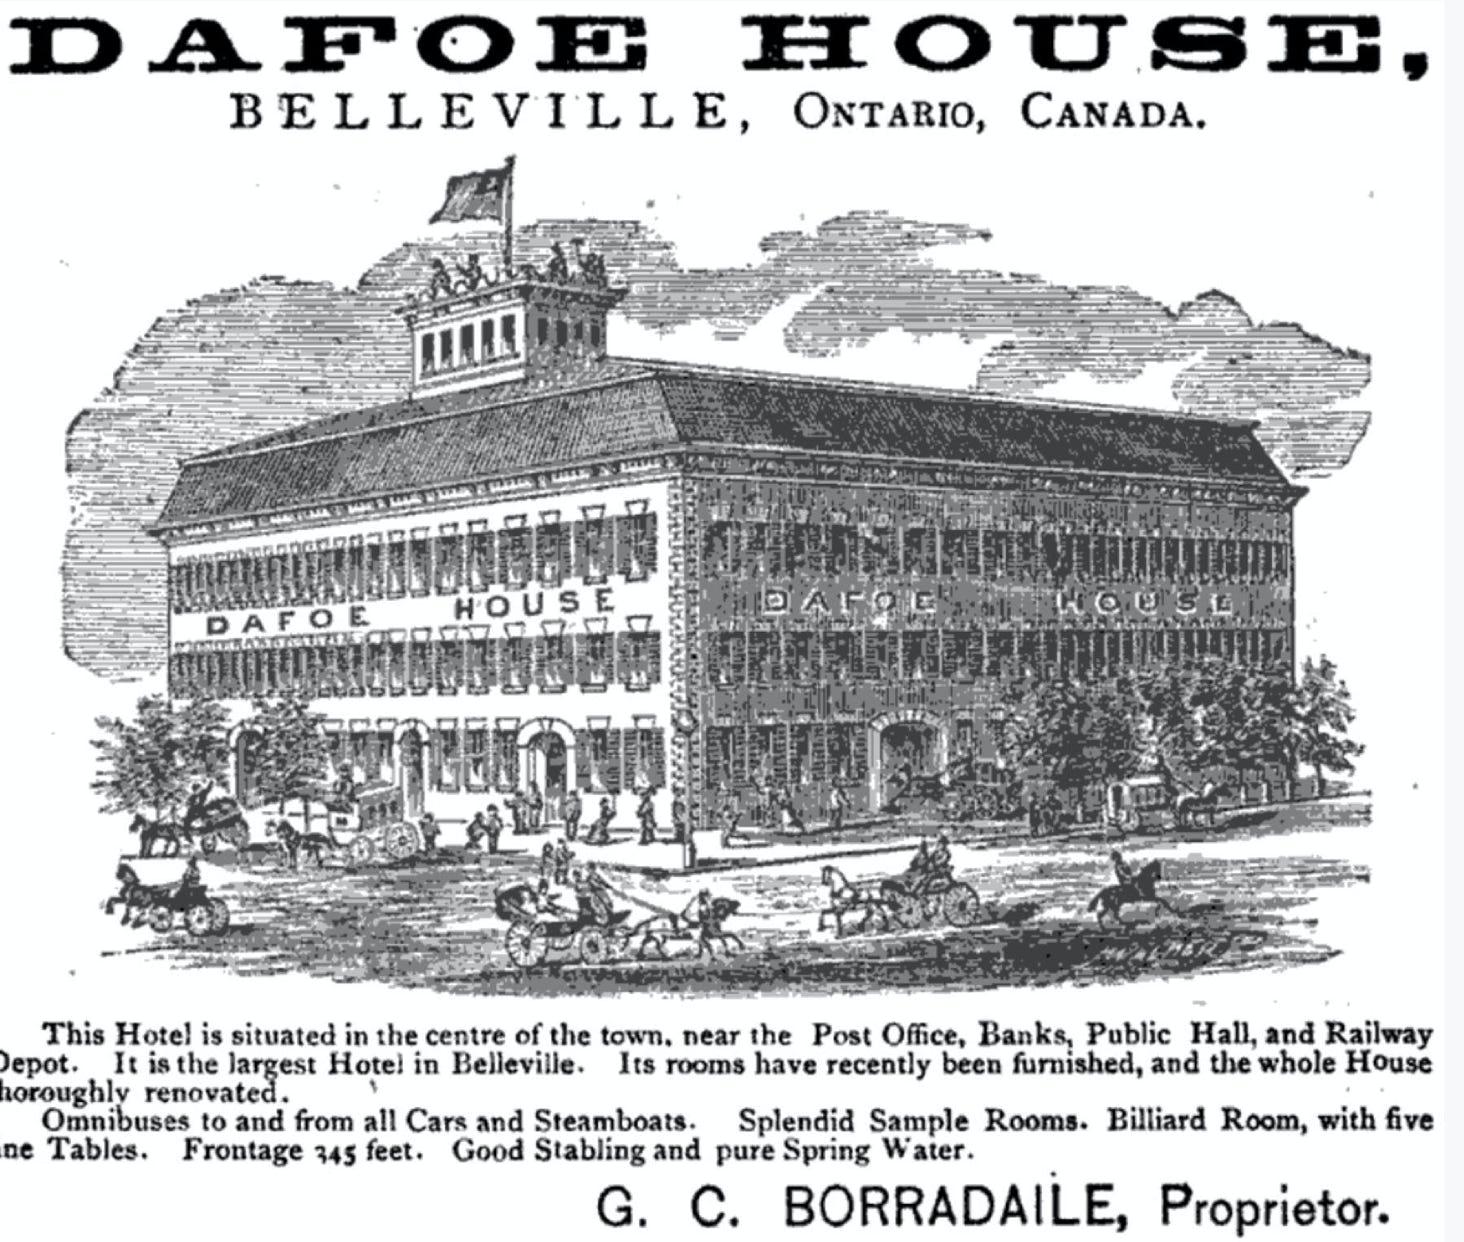 dafoe-house.jpg